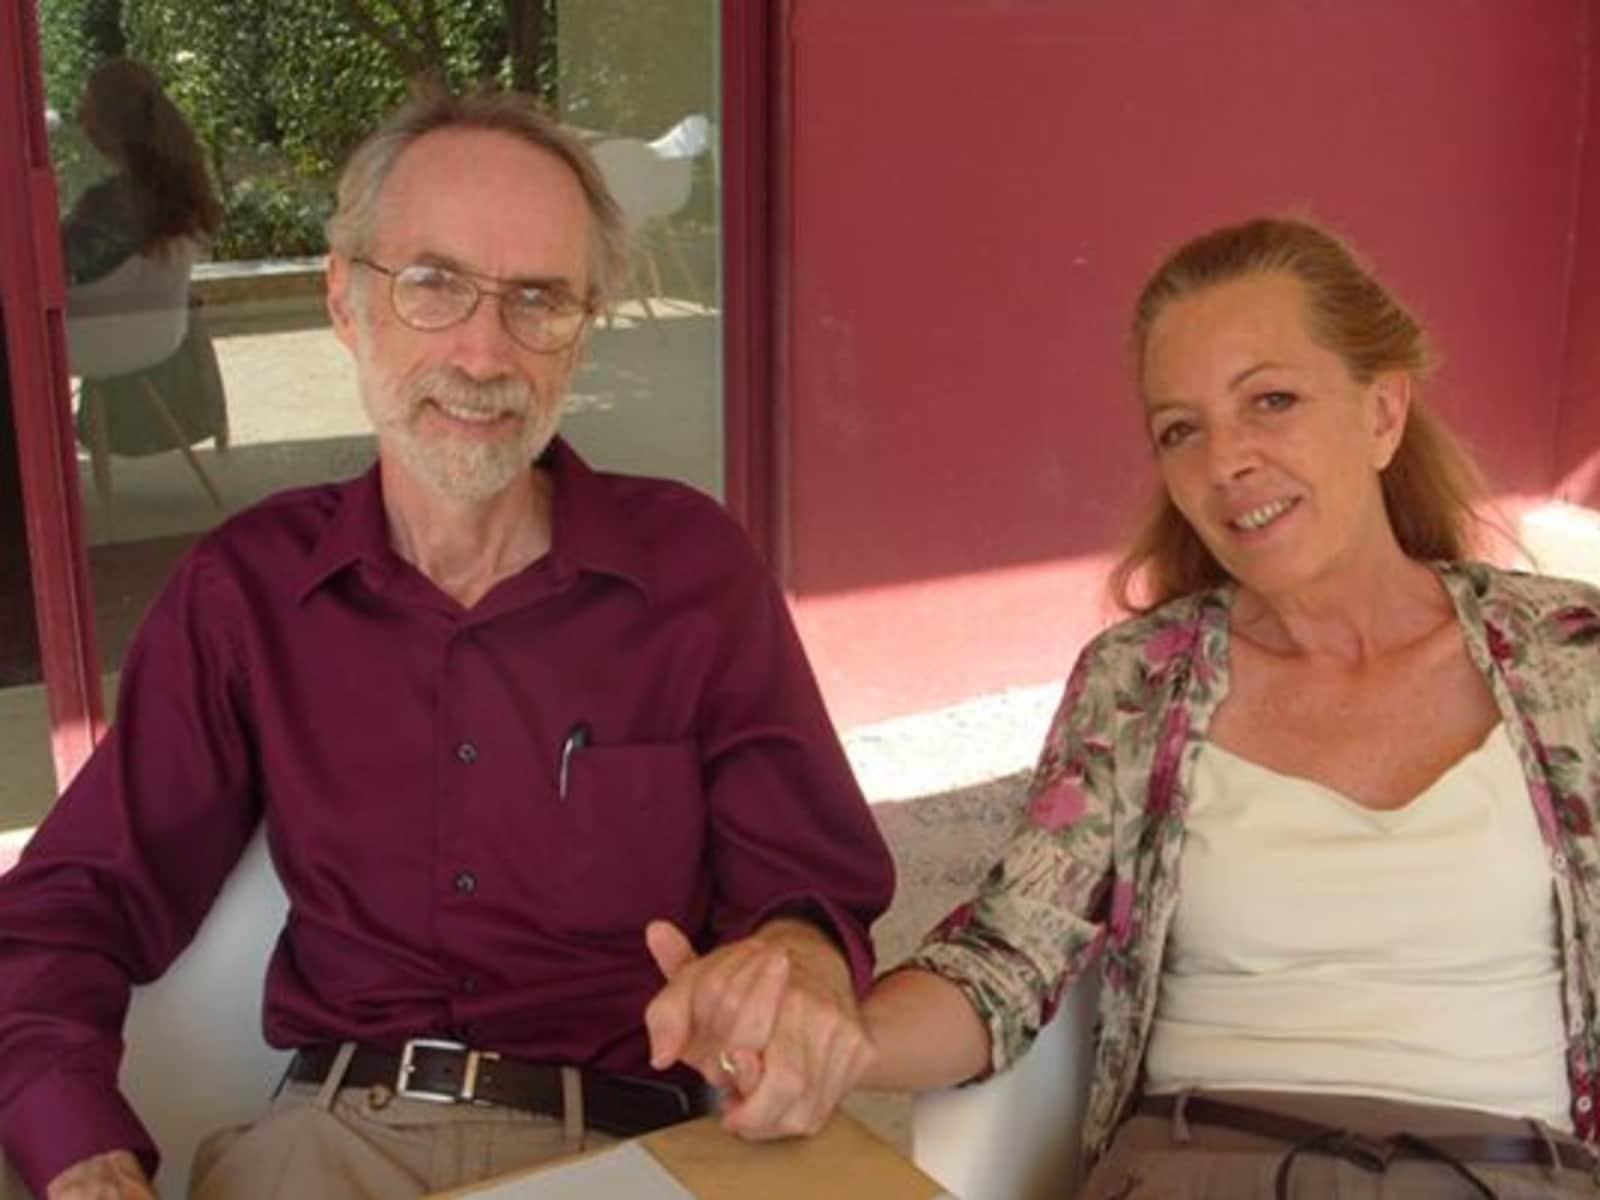 Pete & Teresa from Porto, Portugal